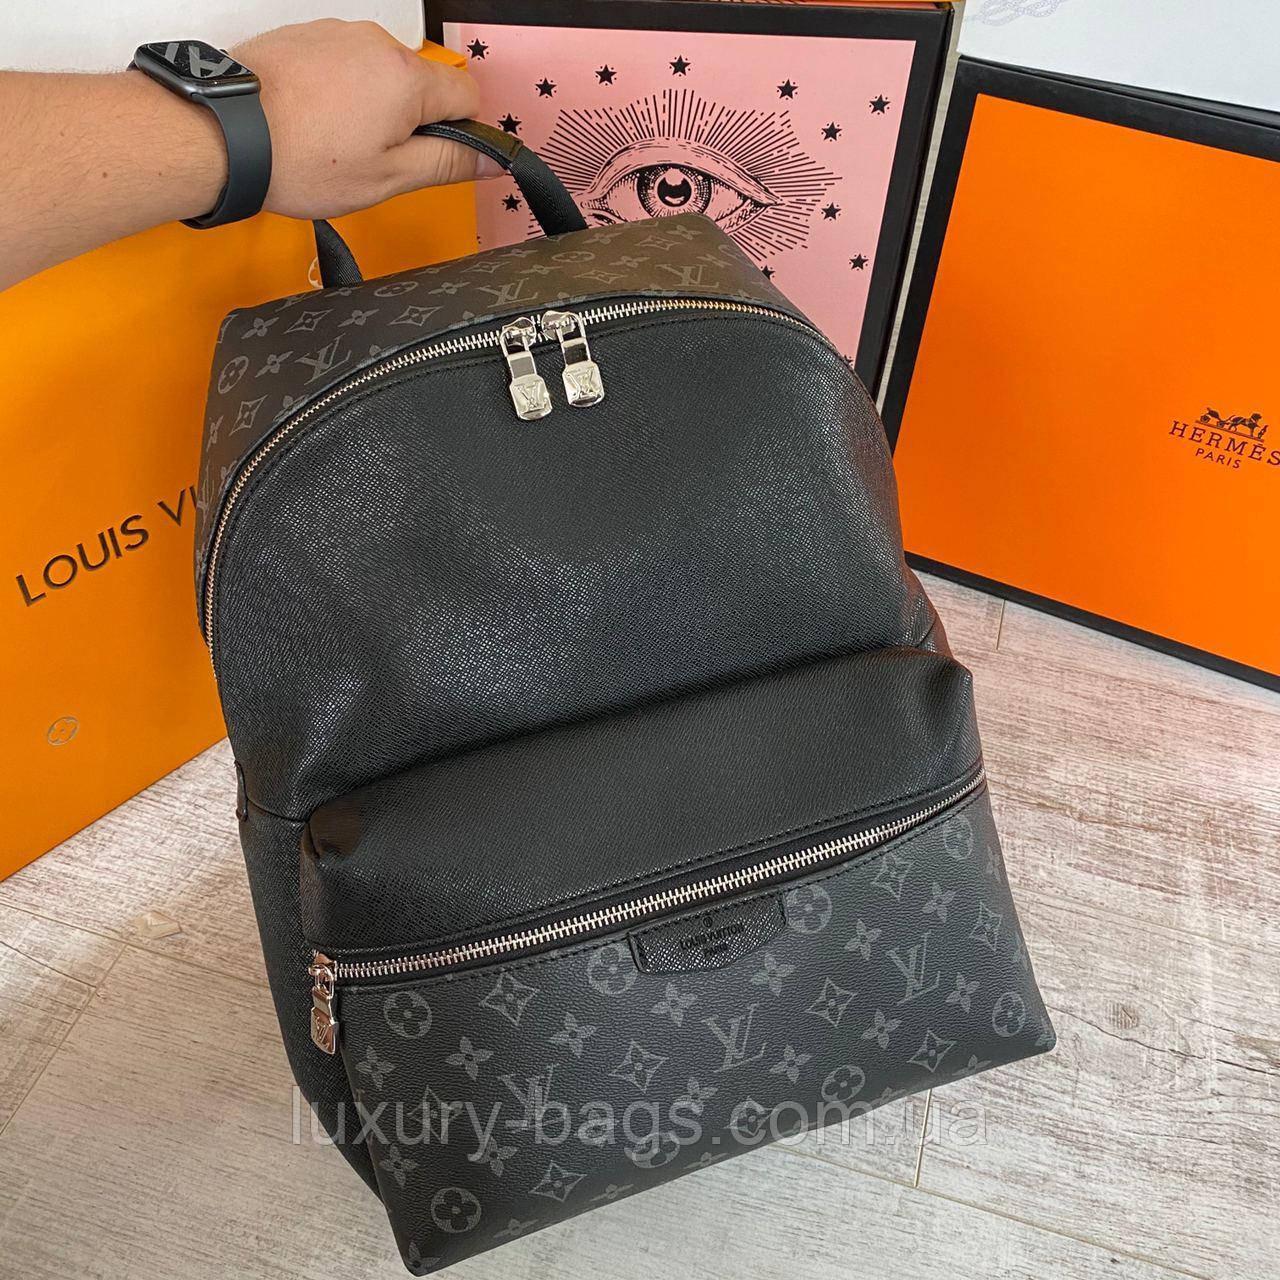 Мужской рюкзак Louis Vuitton Discovery